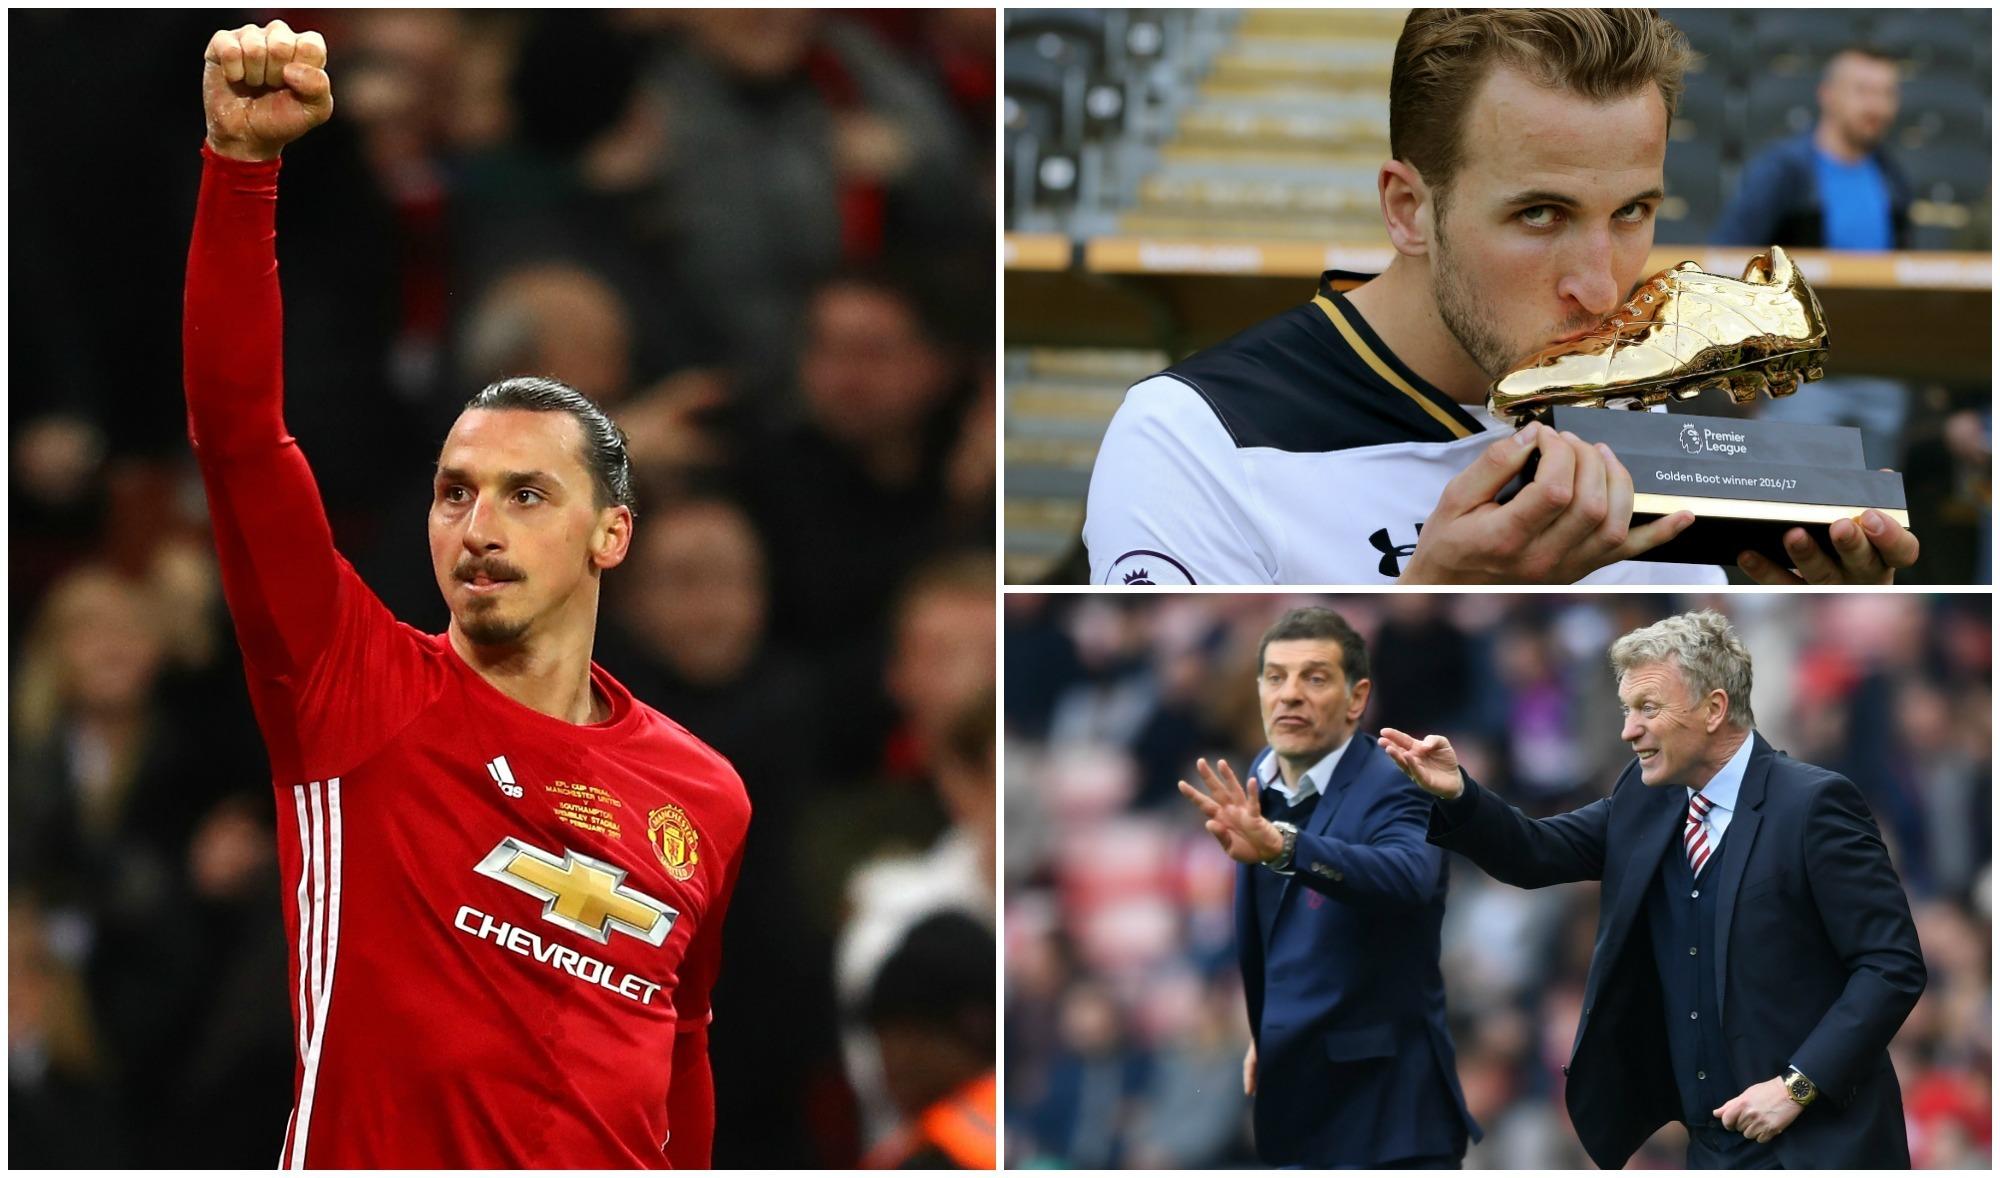 Man Utd's Zlatan Ibrahimovic, golden boot winner Harry Kane, Moyes and Bilic (Michael Steel / Nigel Roddis /Stu Forster/Getty Images)